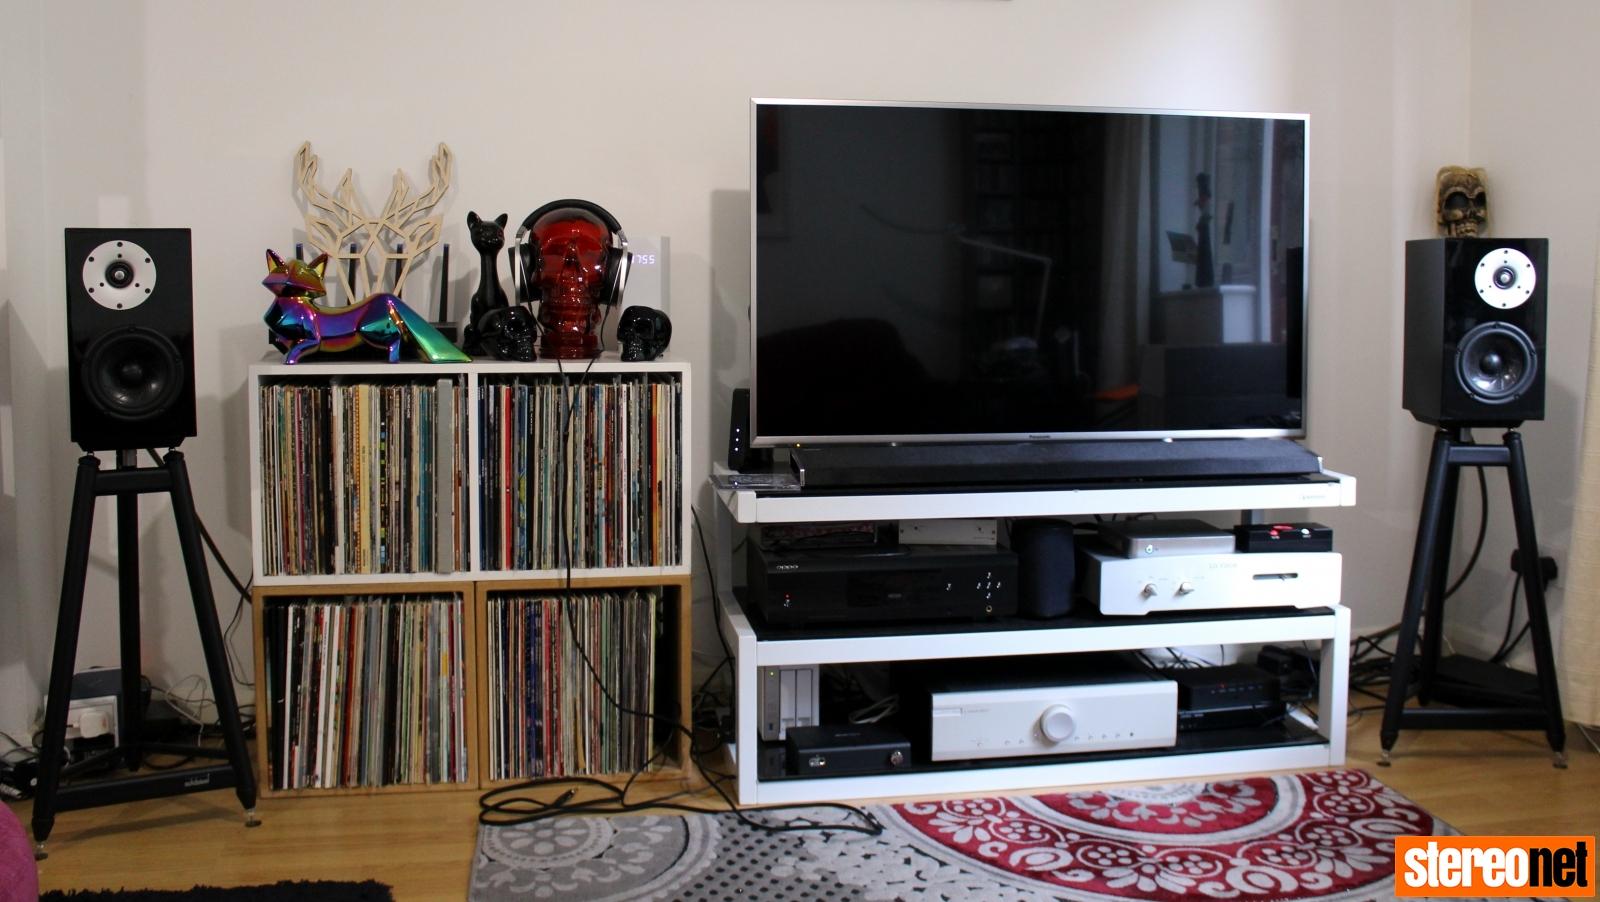 brigadiers audio one audio mu2 speakers on solidsteel ss-6 stands